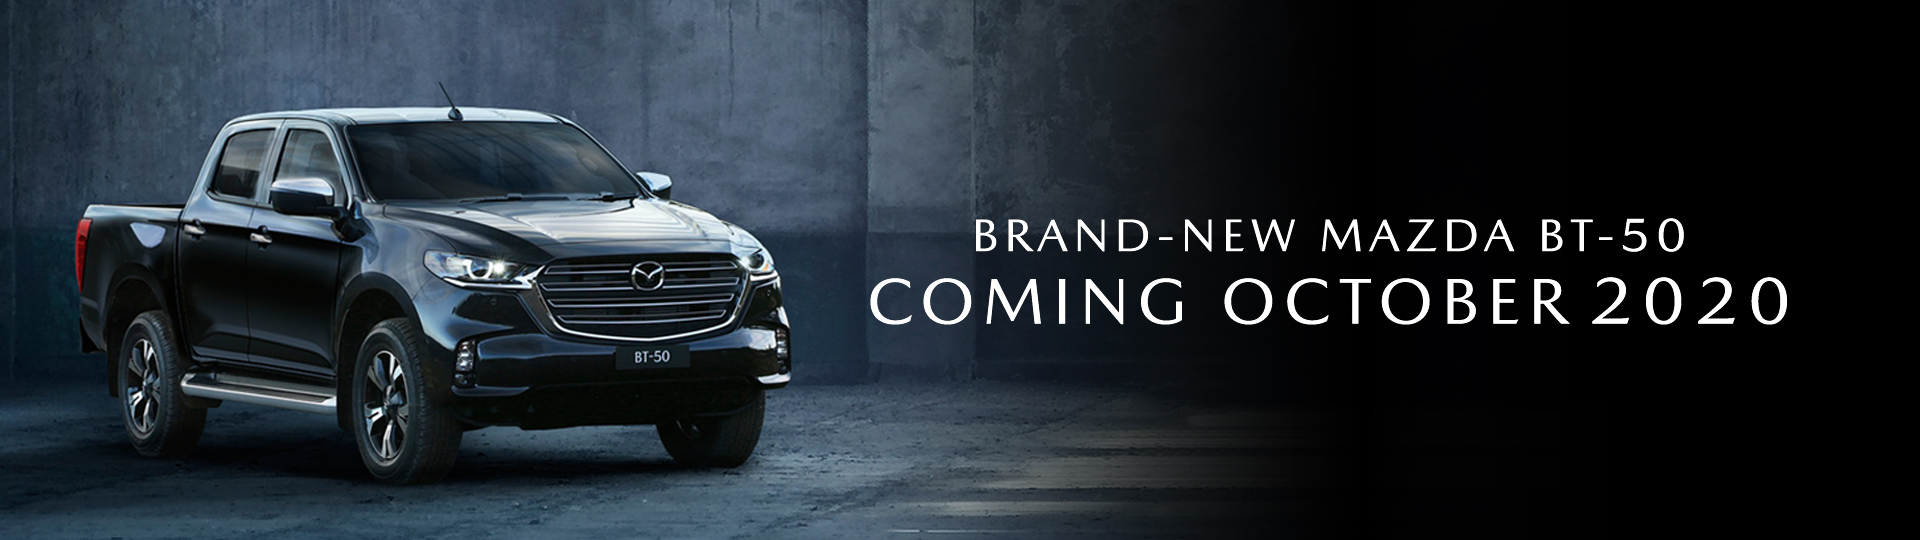 Brand-new Mazda BT-50. Coming October 2020